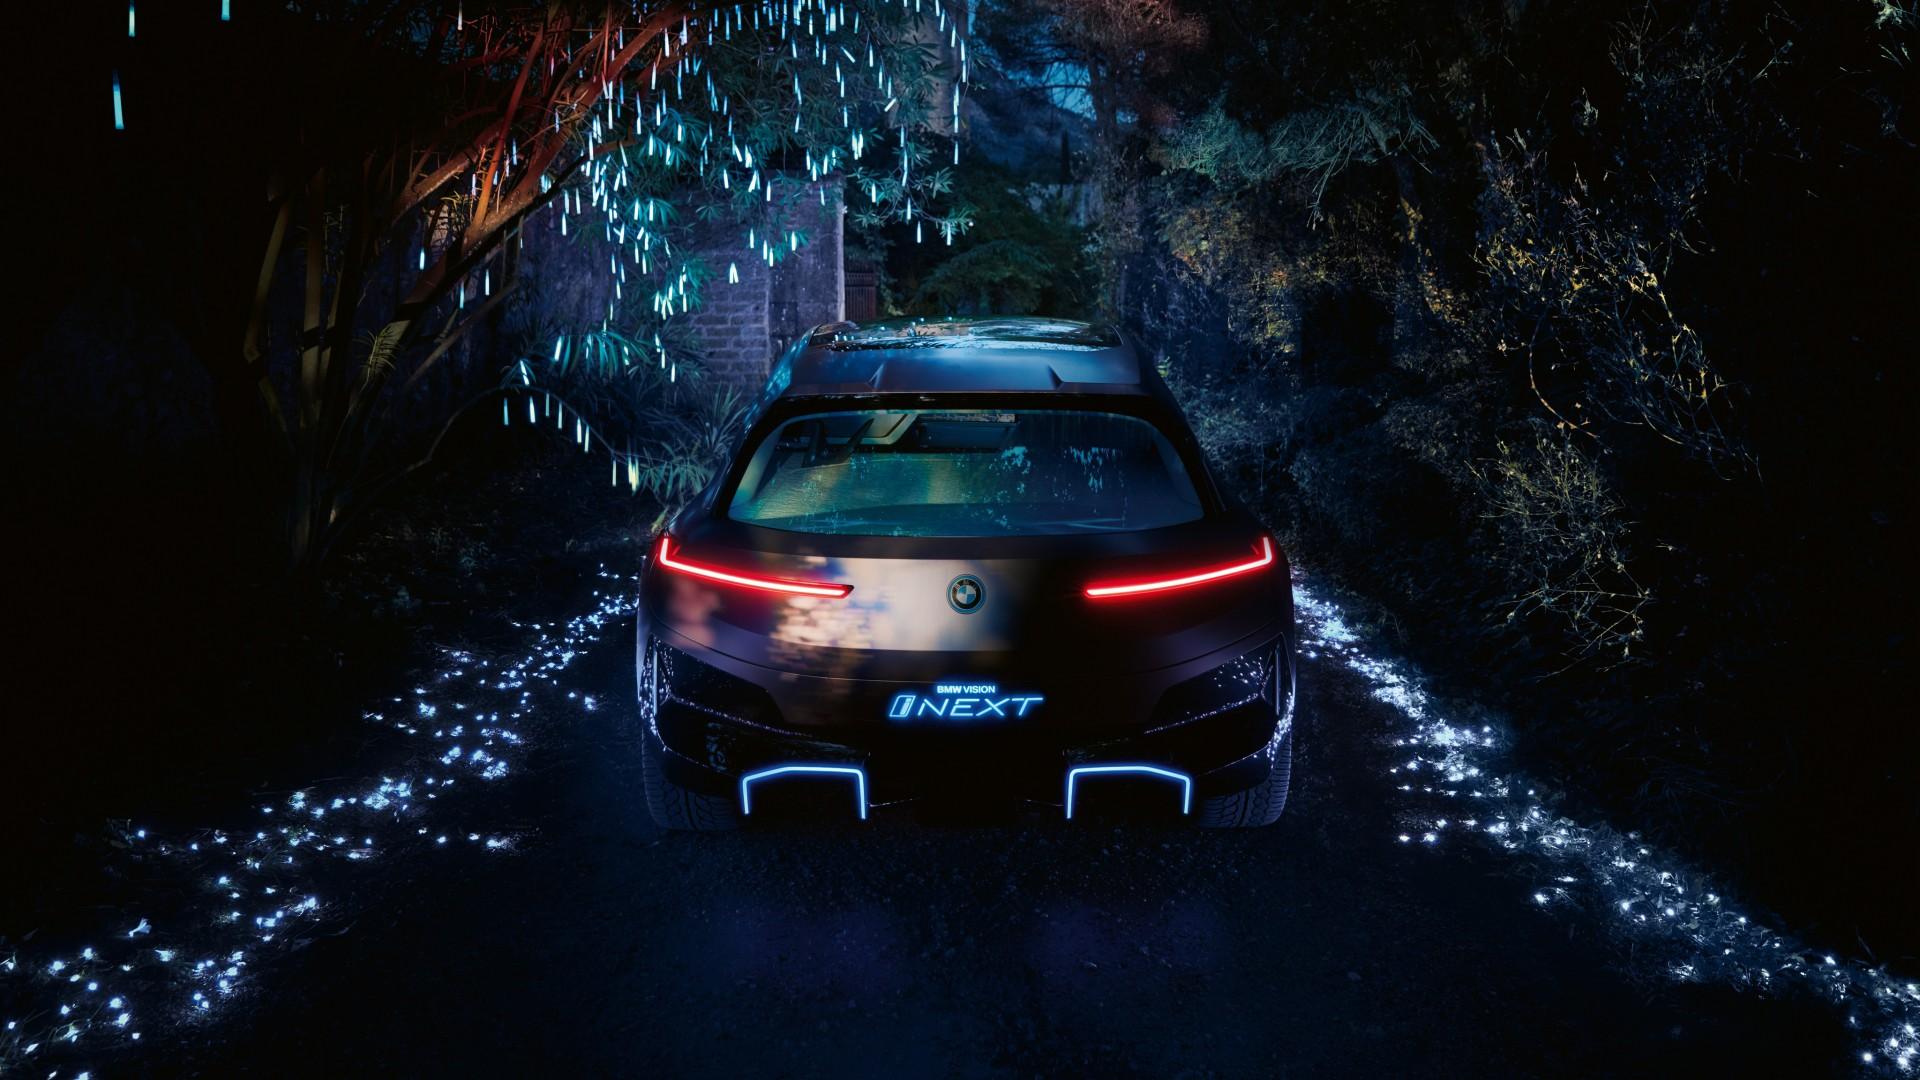 BMW Vision iNEXT Future SUV Car 4K 4 Wallpaper | HD Car